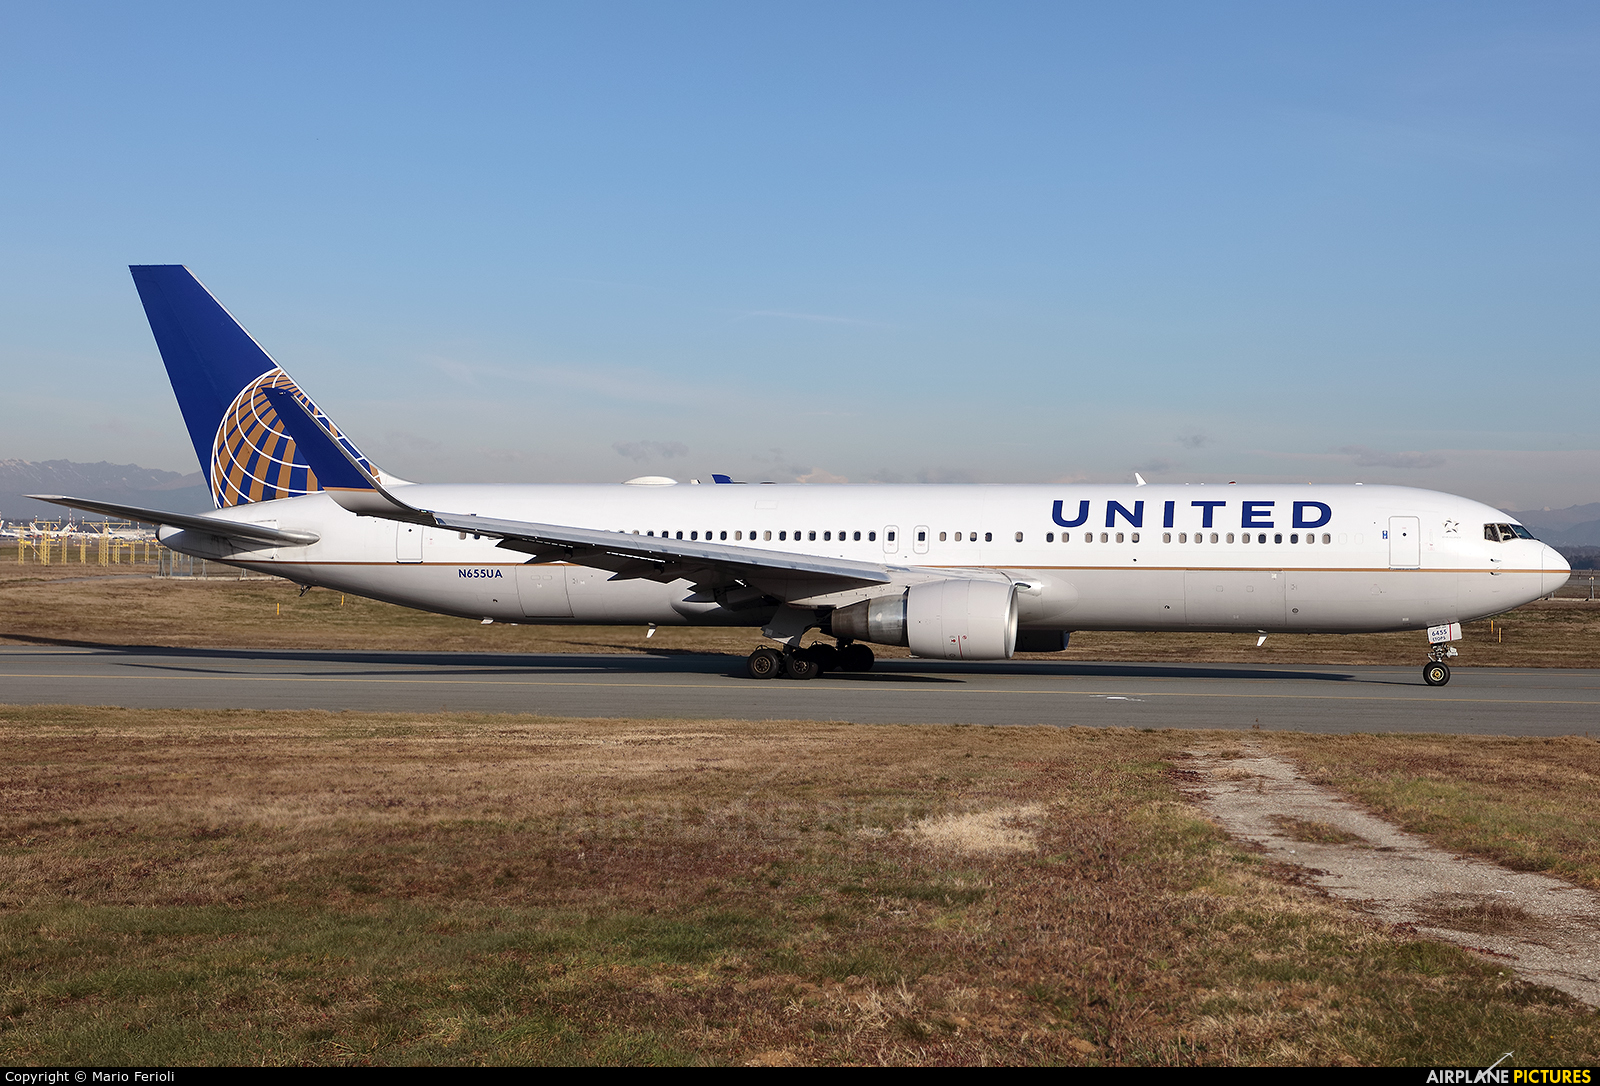 United Airlines N655UA aircraft at Milan - Malpensa